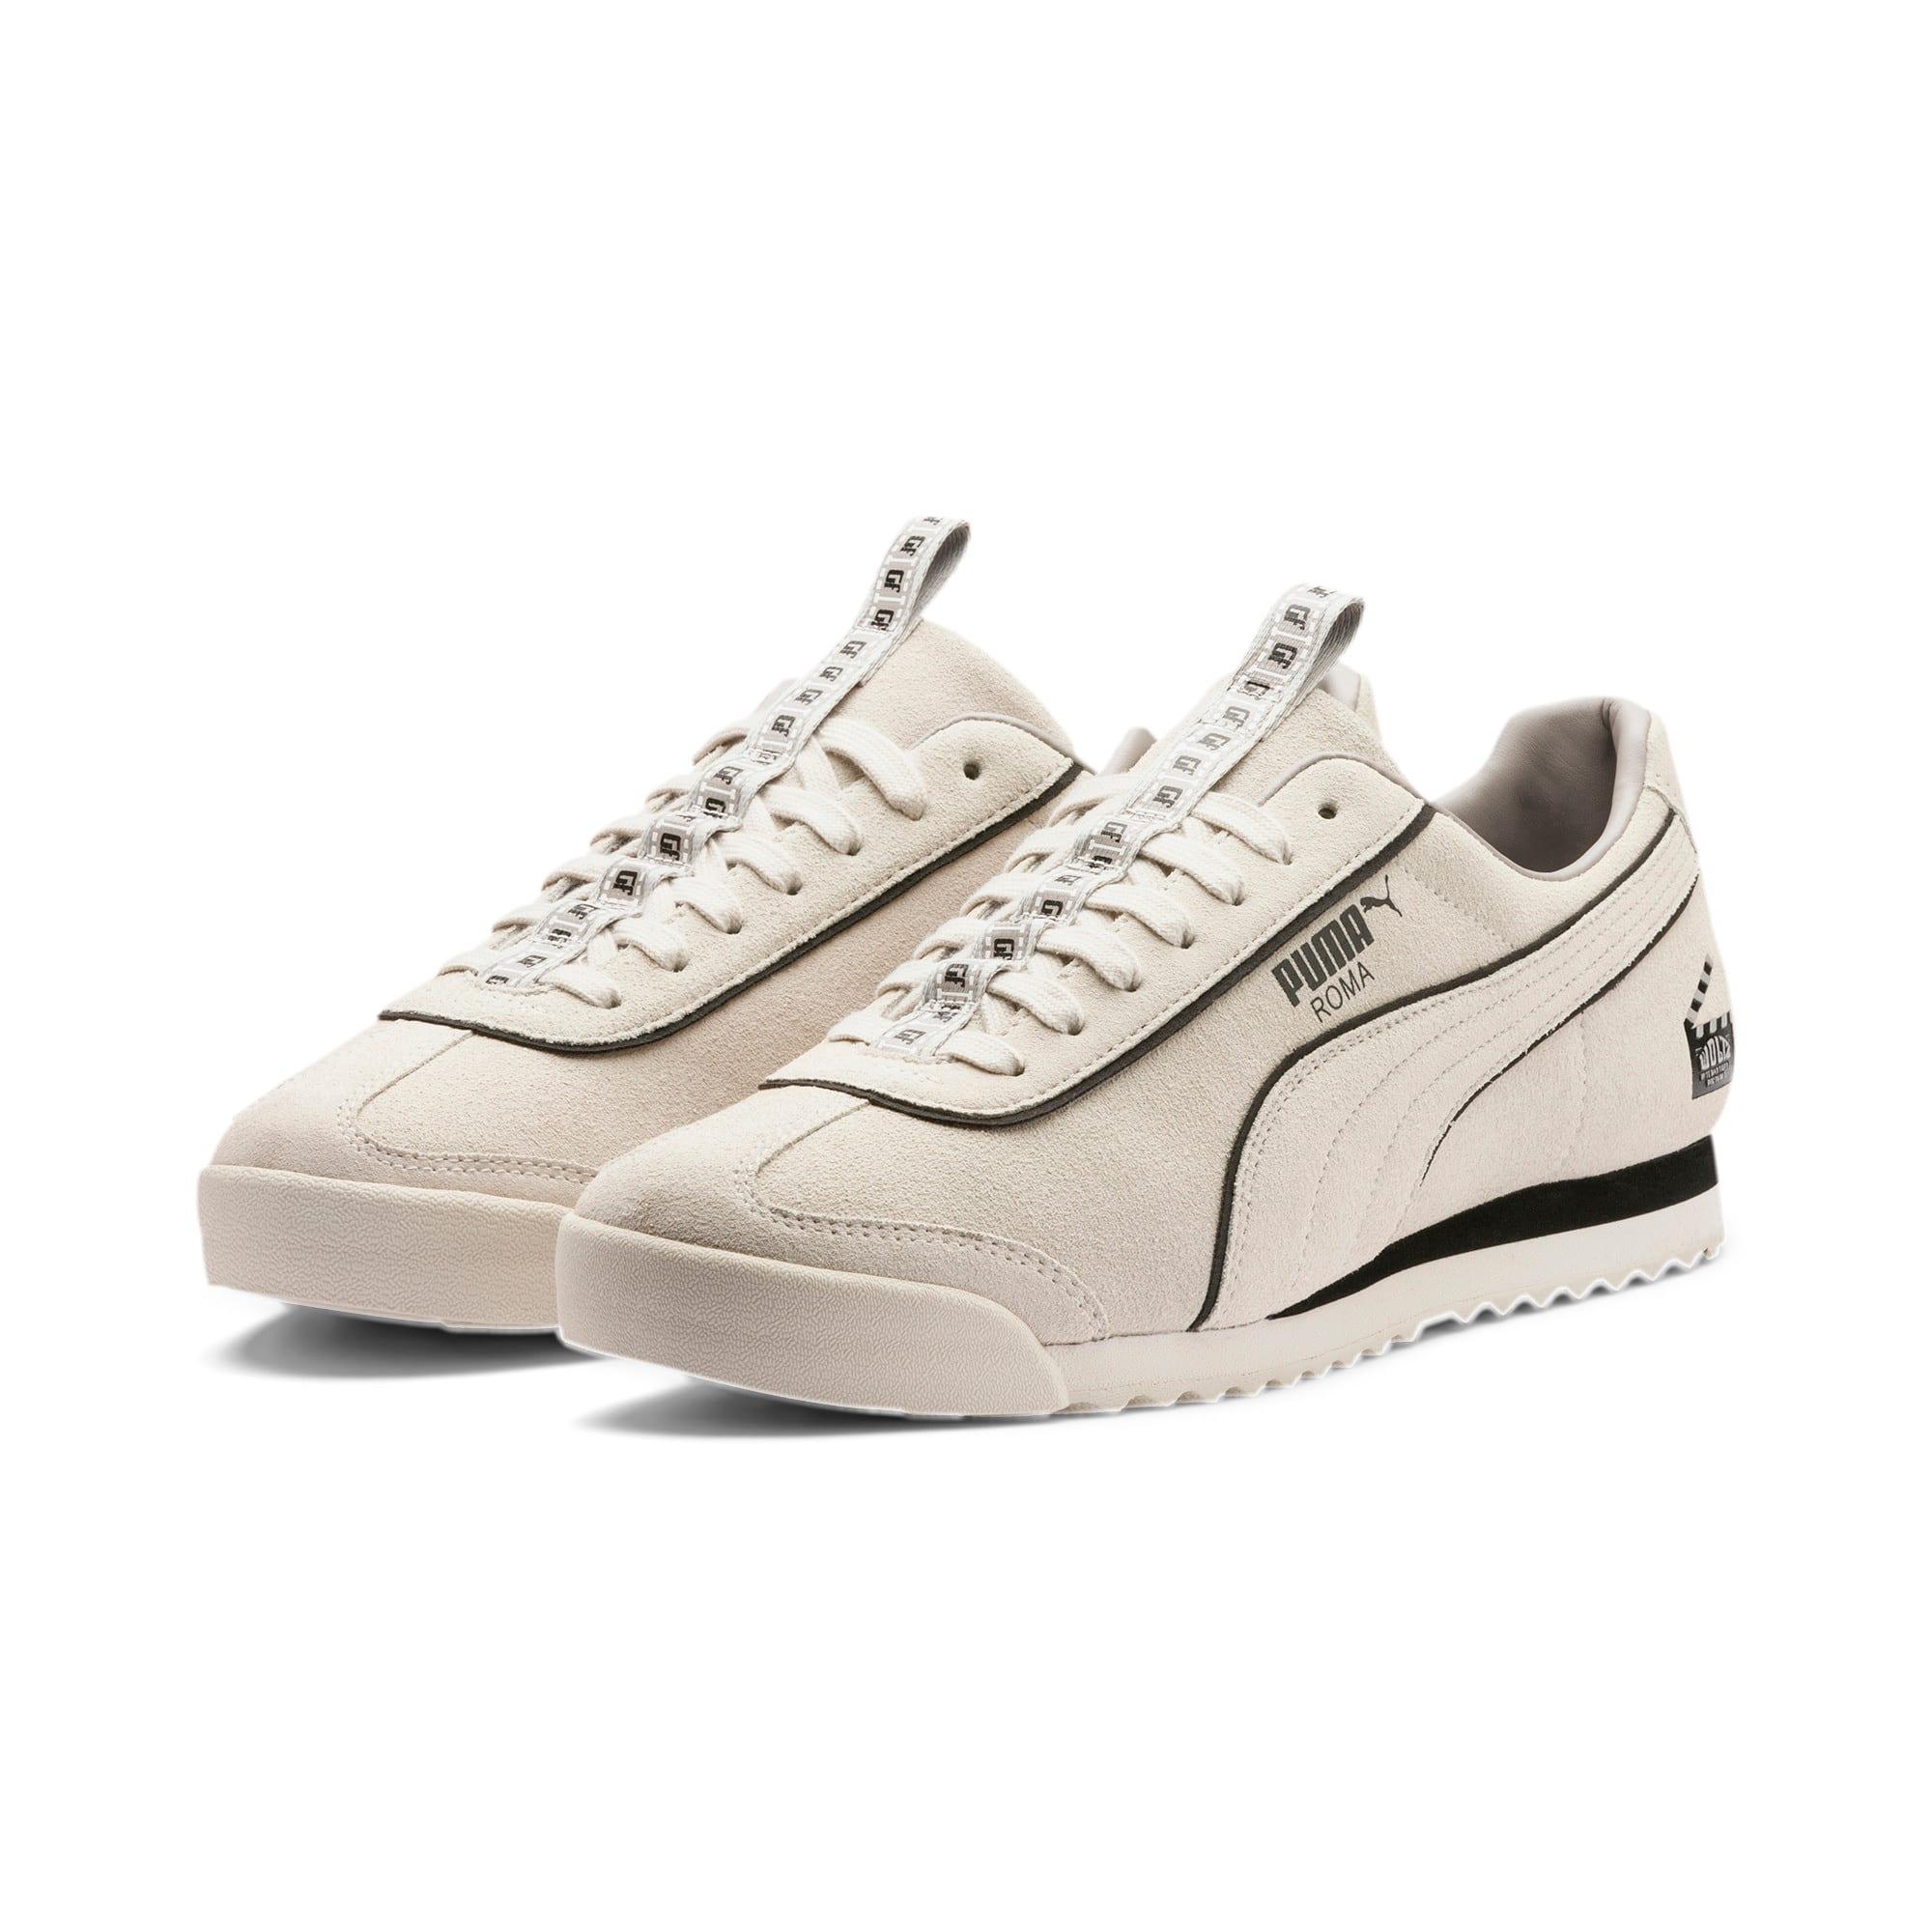 Miniatura 2 de Zapatos deportivos PUMA x THE GODFATHER Roma Woltz, WINDCHIME-Puma negro, mediano